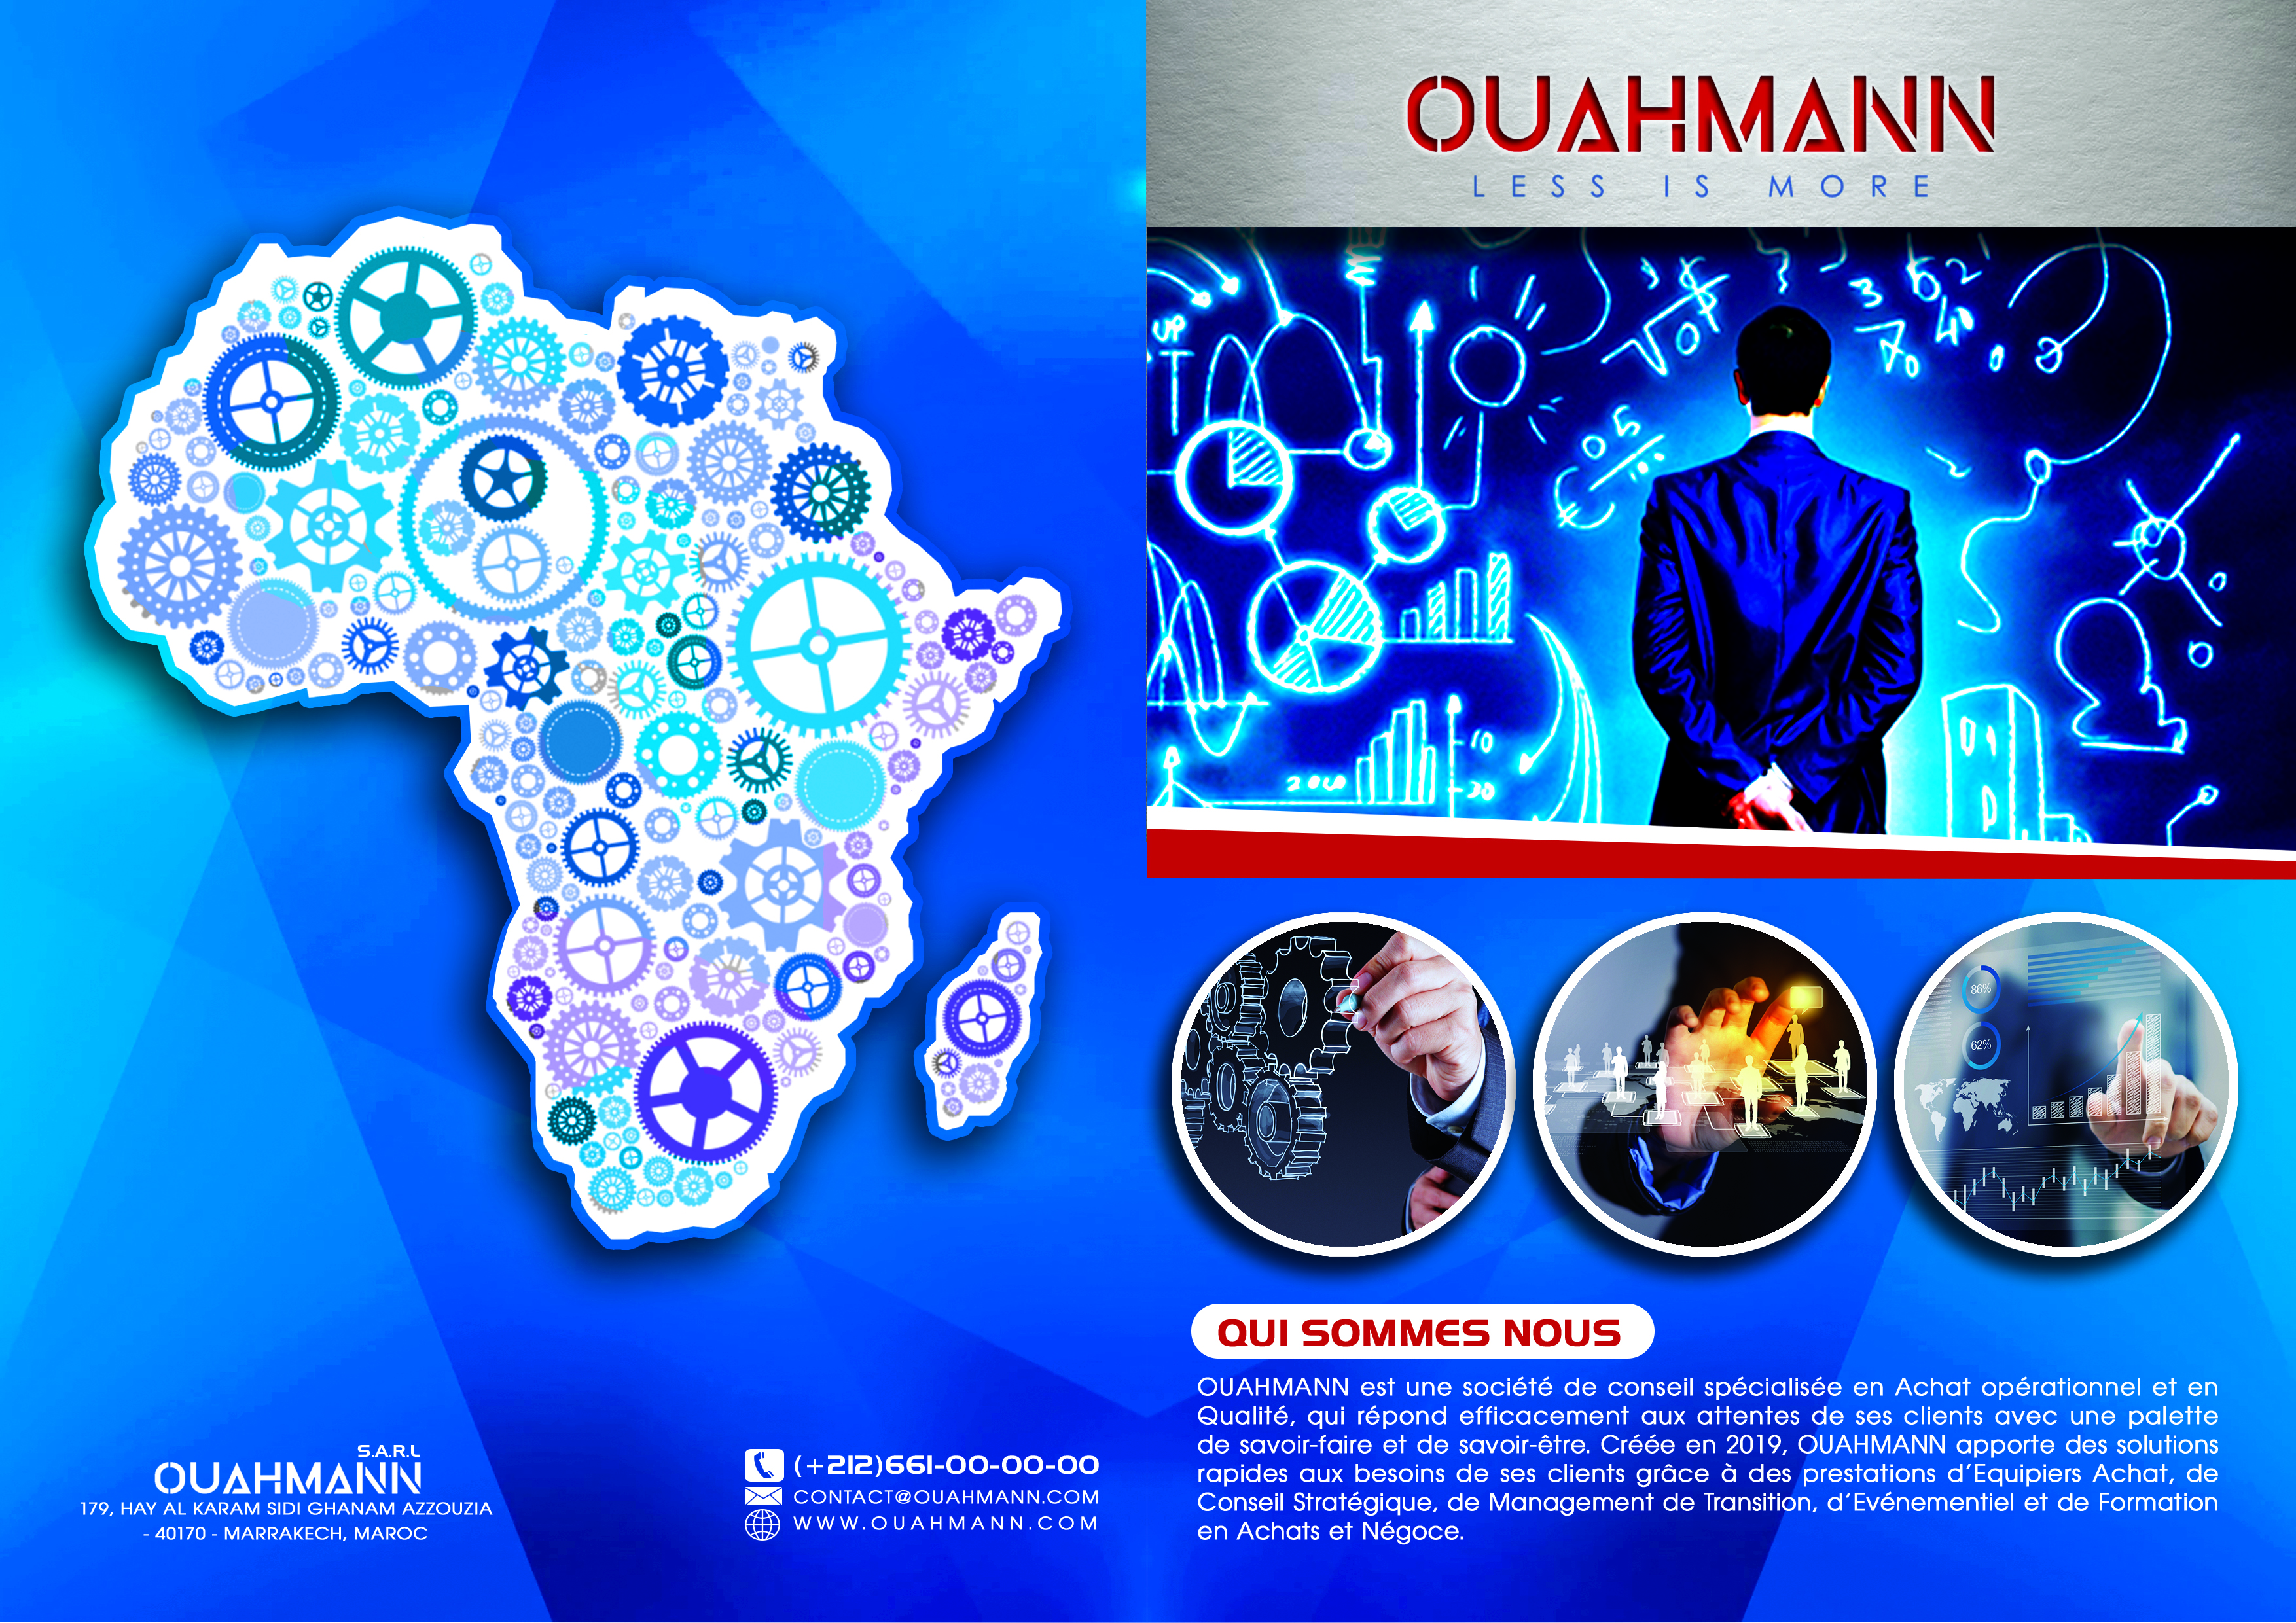 OUAHMANN-Outside4